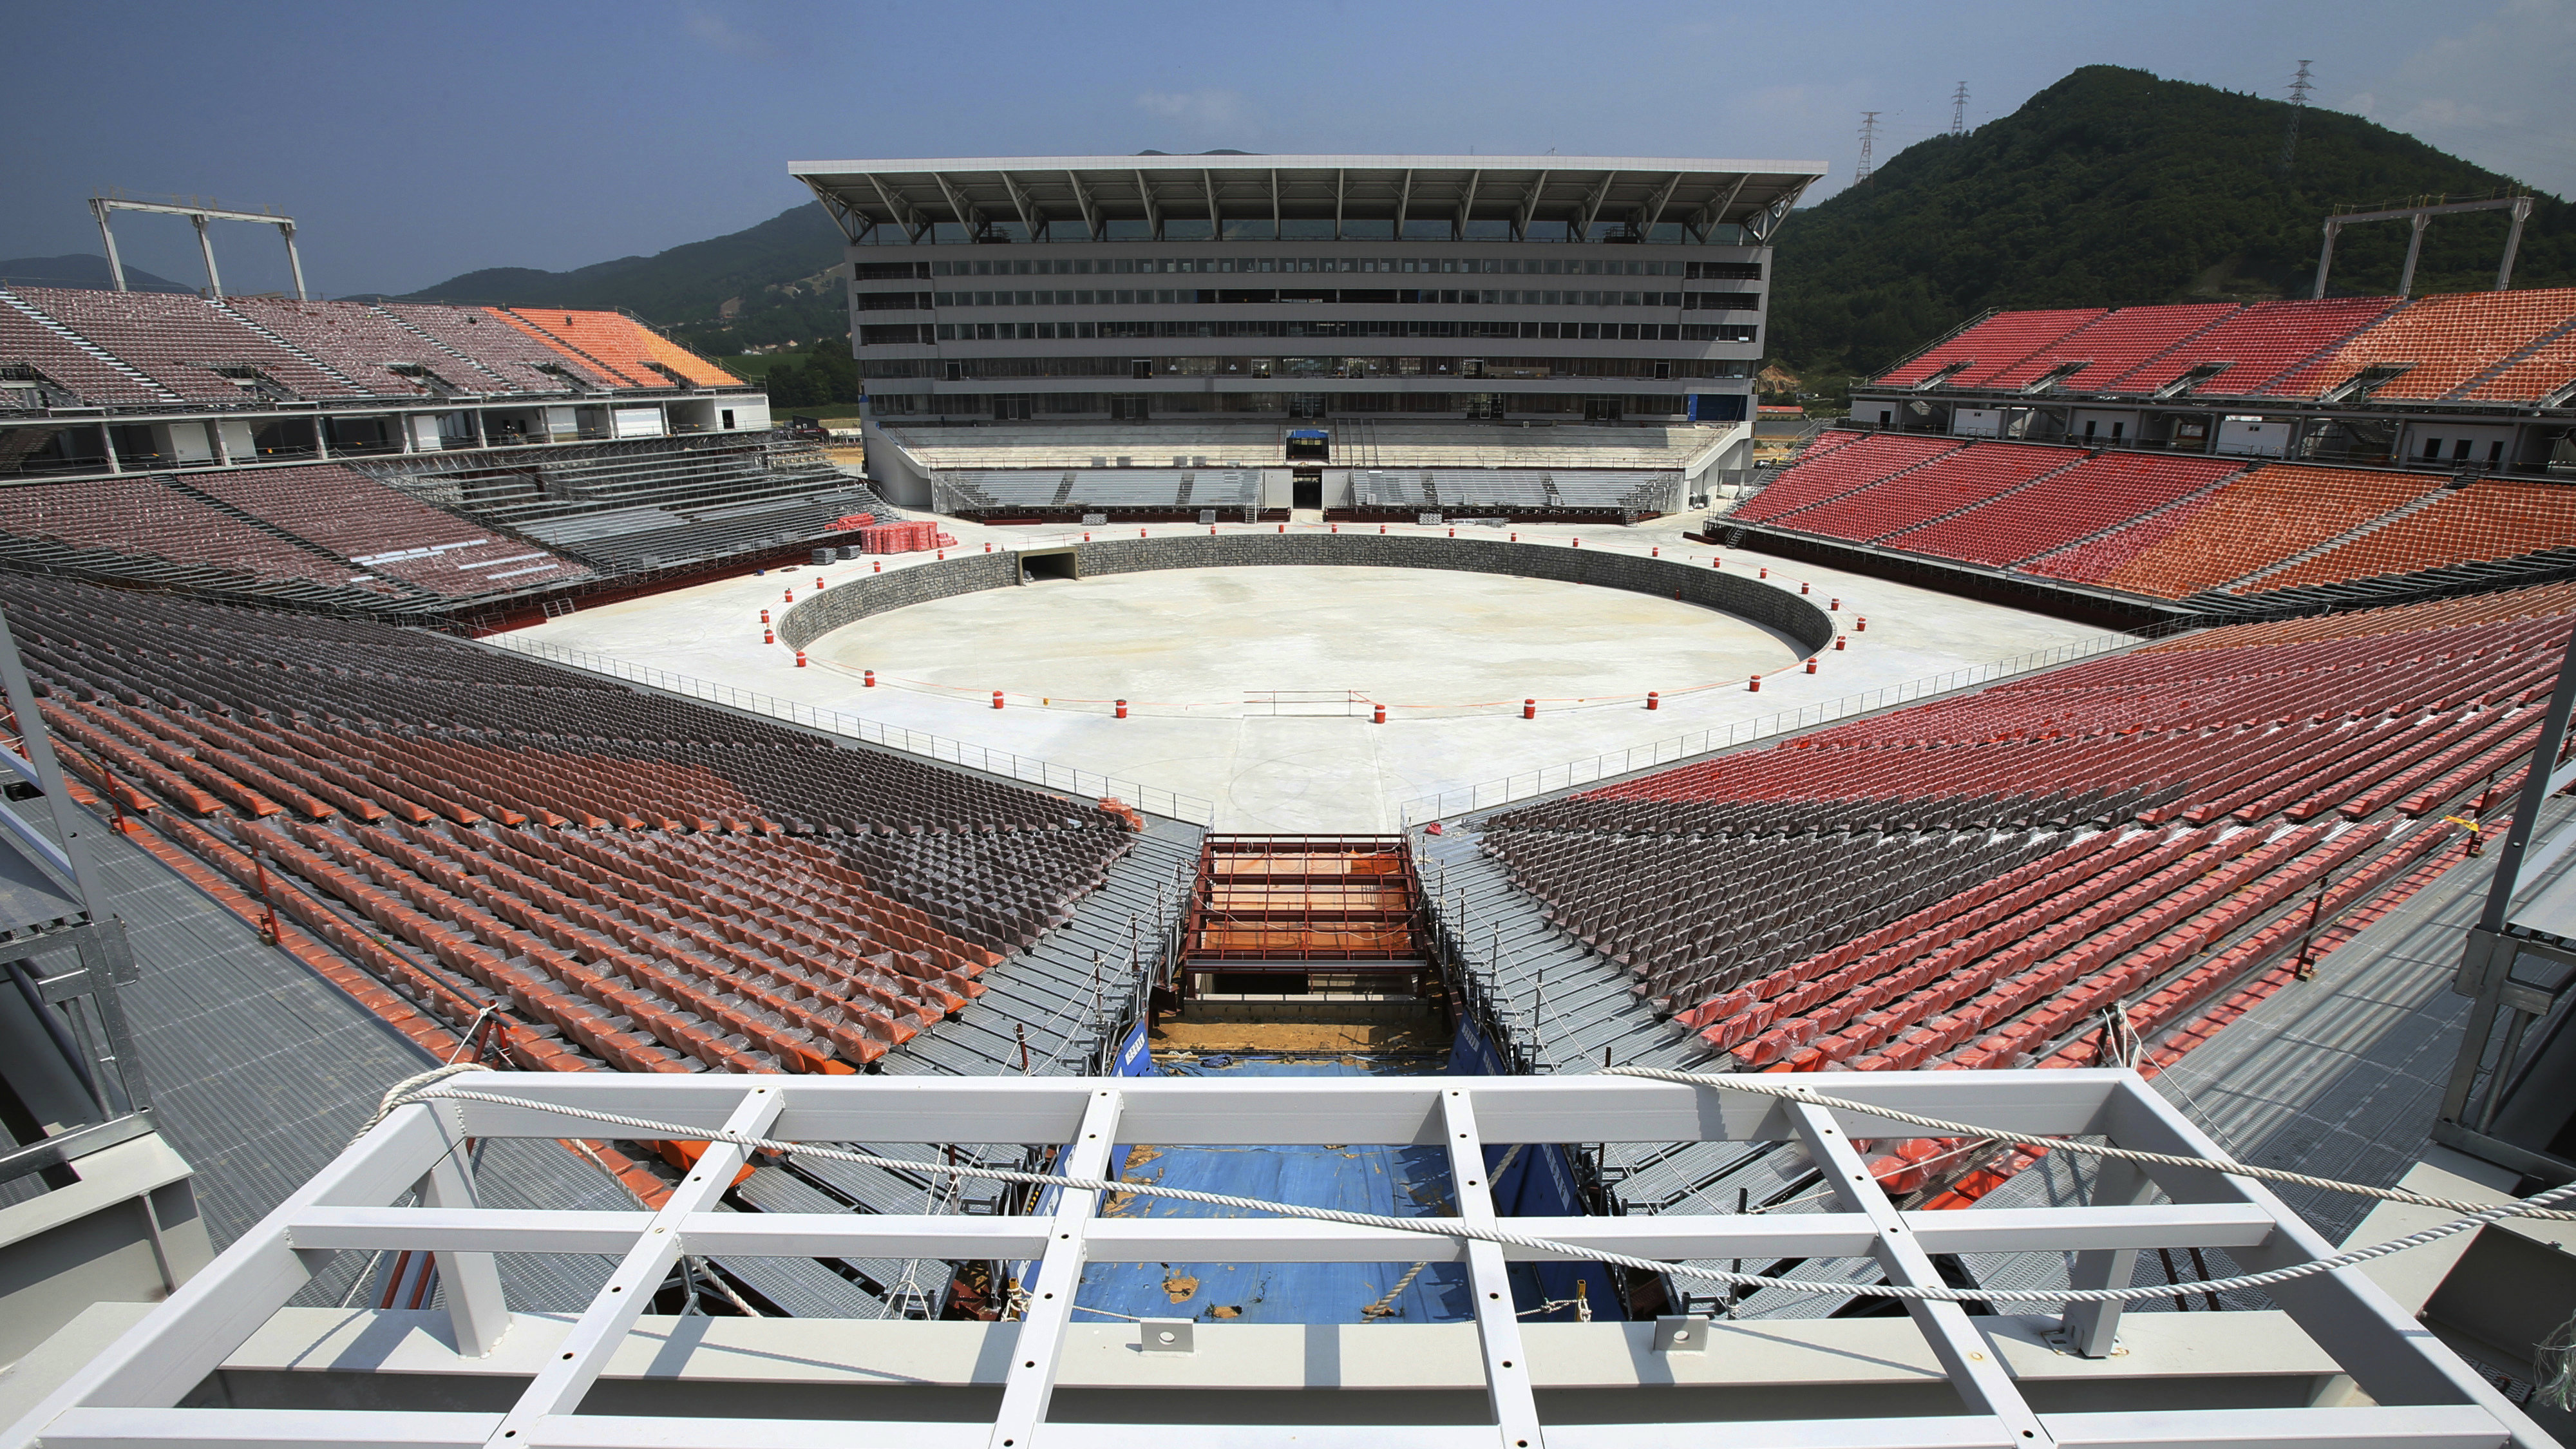 the Pyeongchang Olympic Stadium under construction in Pyeongchang, South Korea.